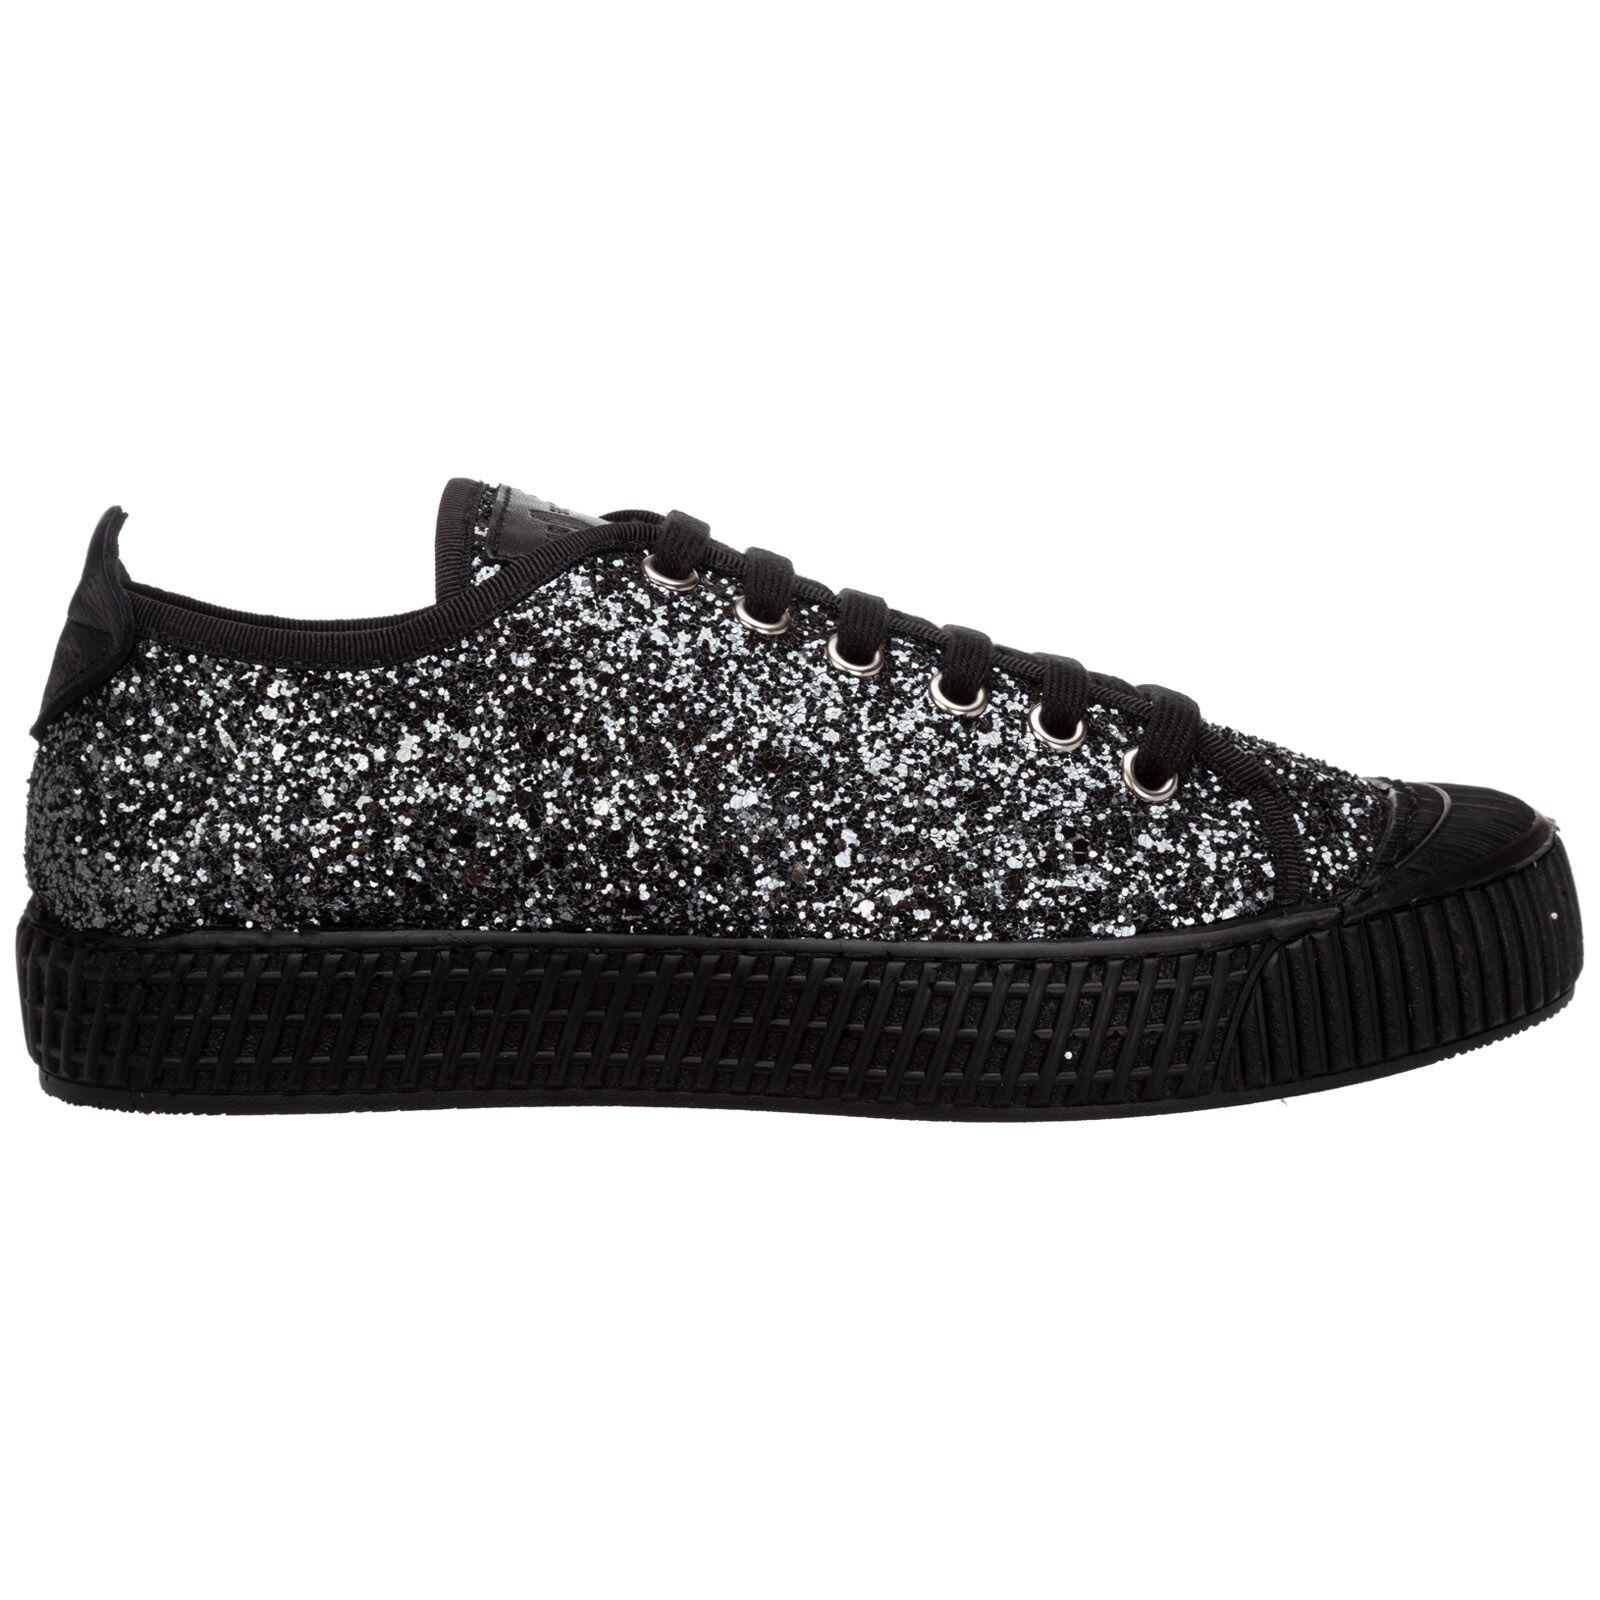 Car Shoe Women's shoes trainers sneakers  - Black - Size: 39